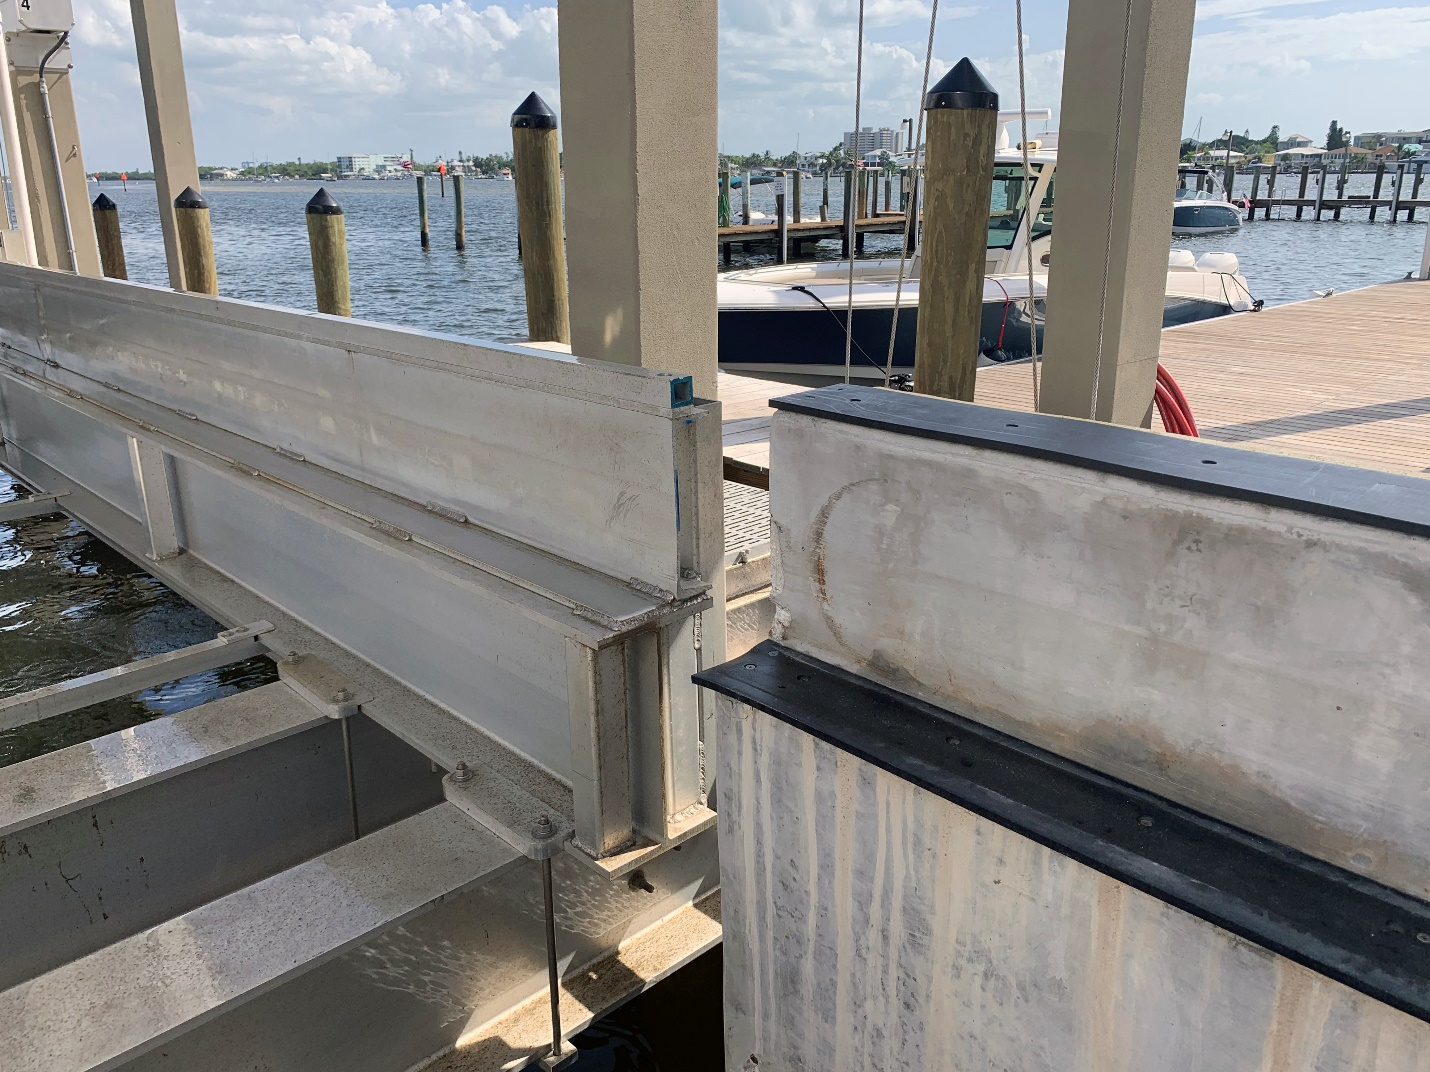 Superlift Cradles On Imm Quality Boat Lift